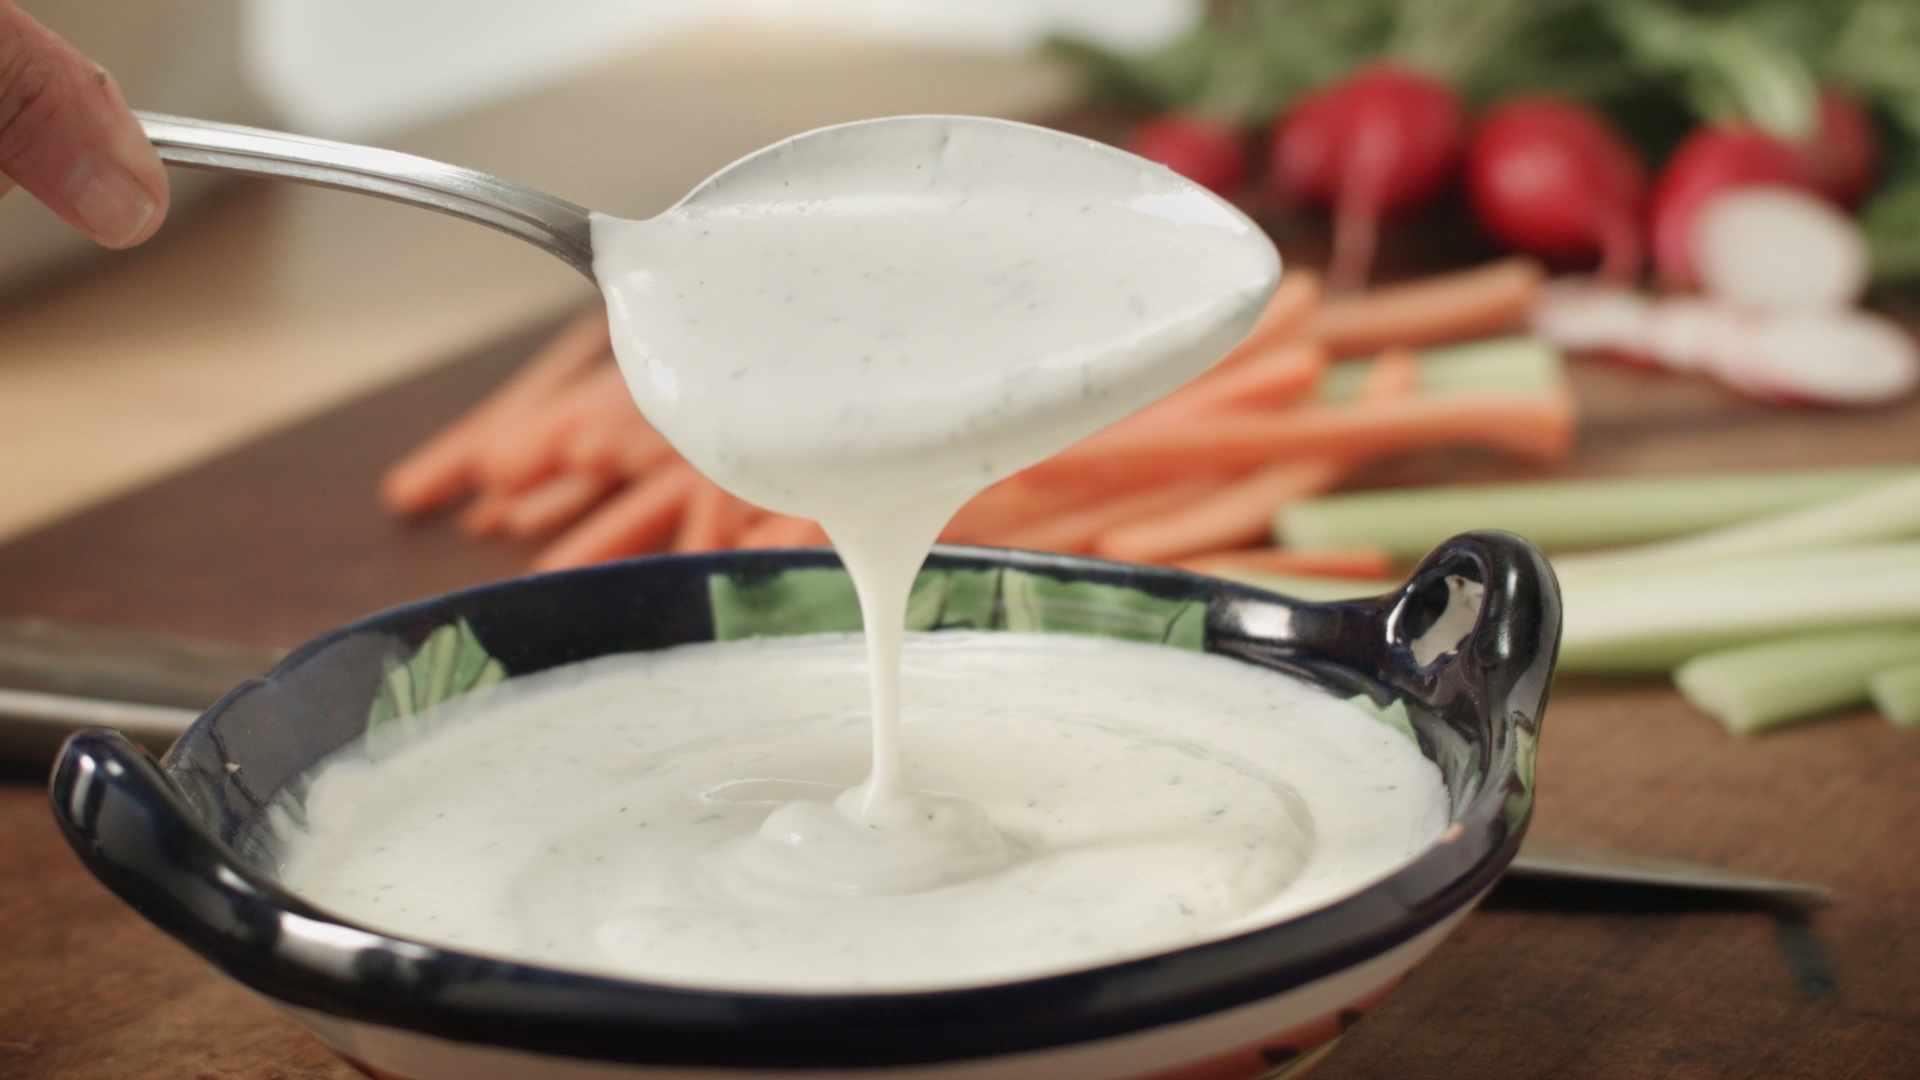 making-mayo-recipes-house-ranch-dressing-16-x-9